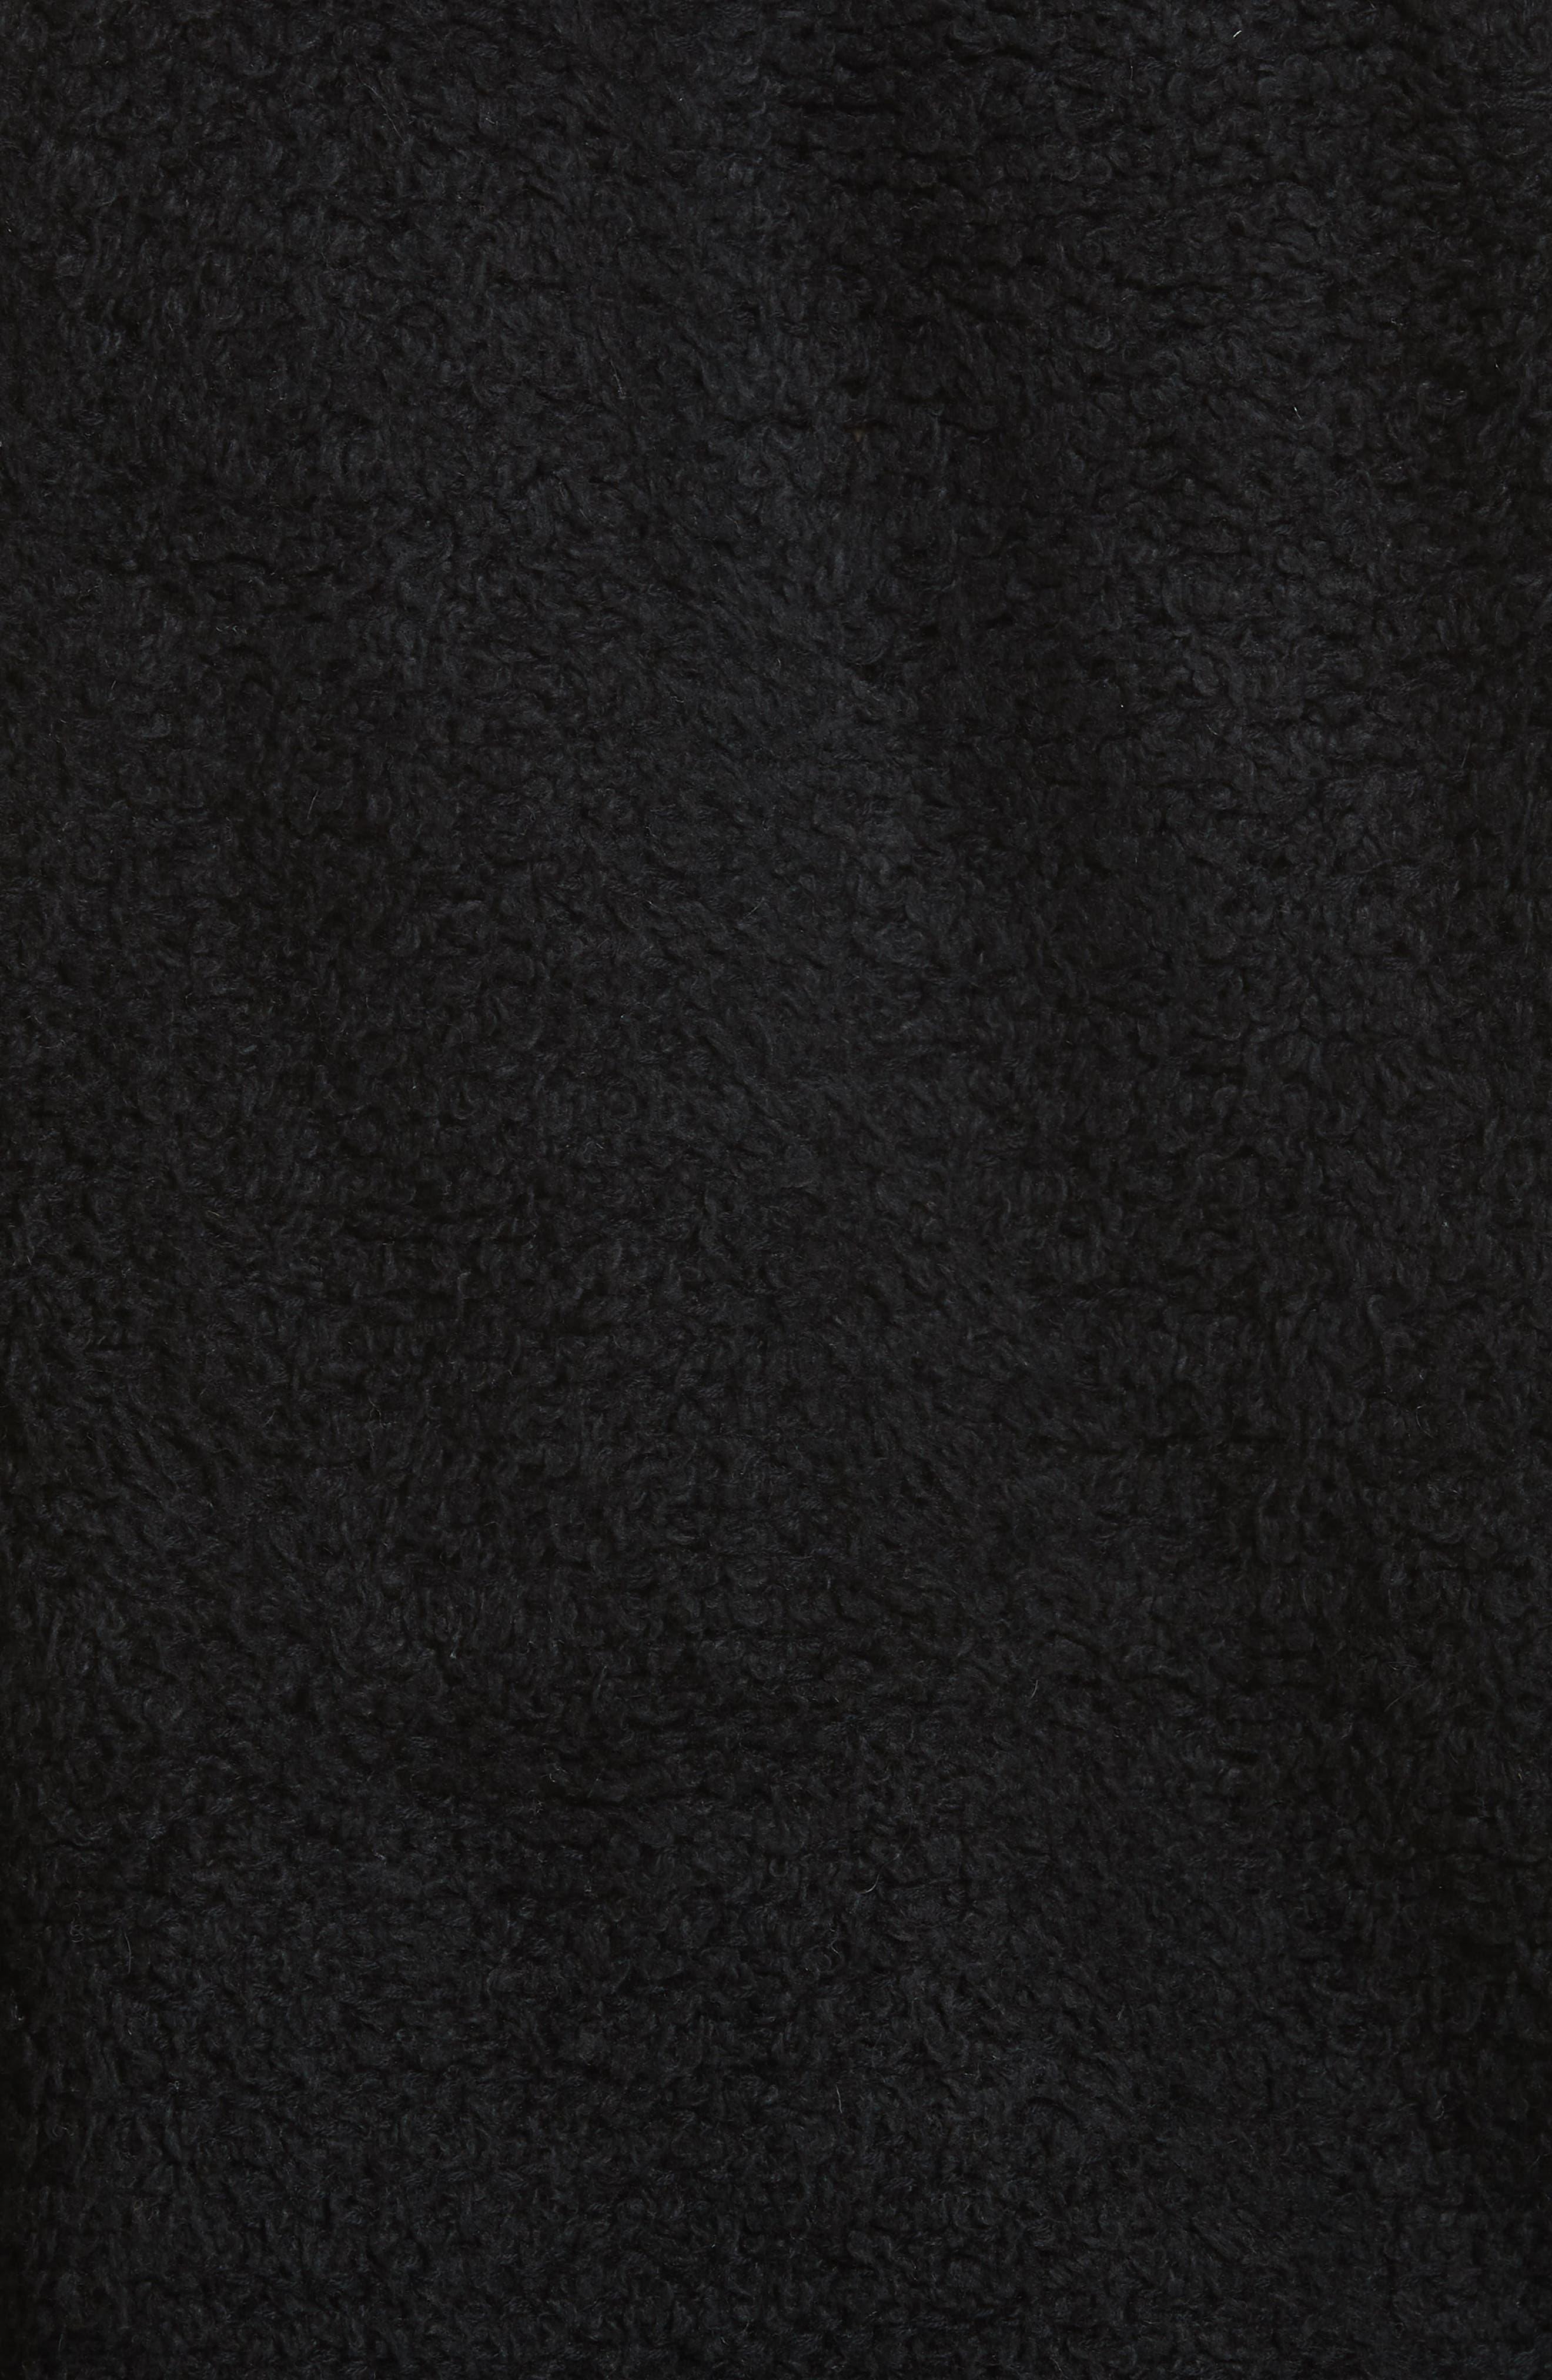 Brooke Teddy Sweatshirt,                             Alternate thumbnail 5, color,                             BLACK